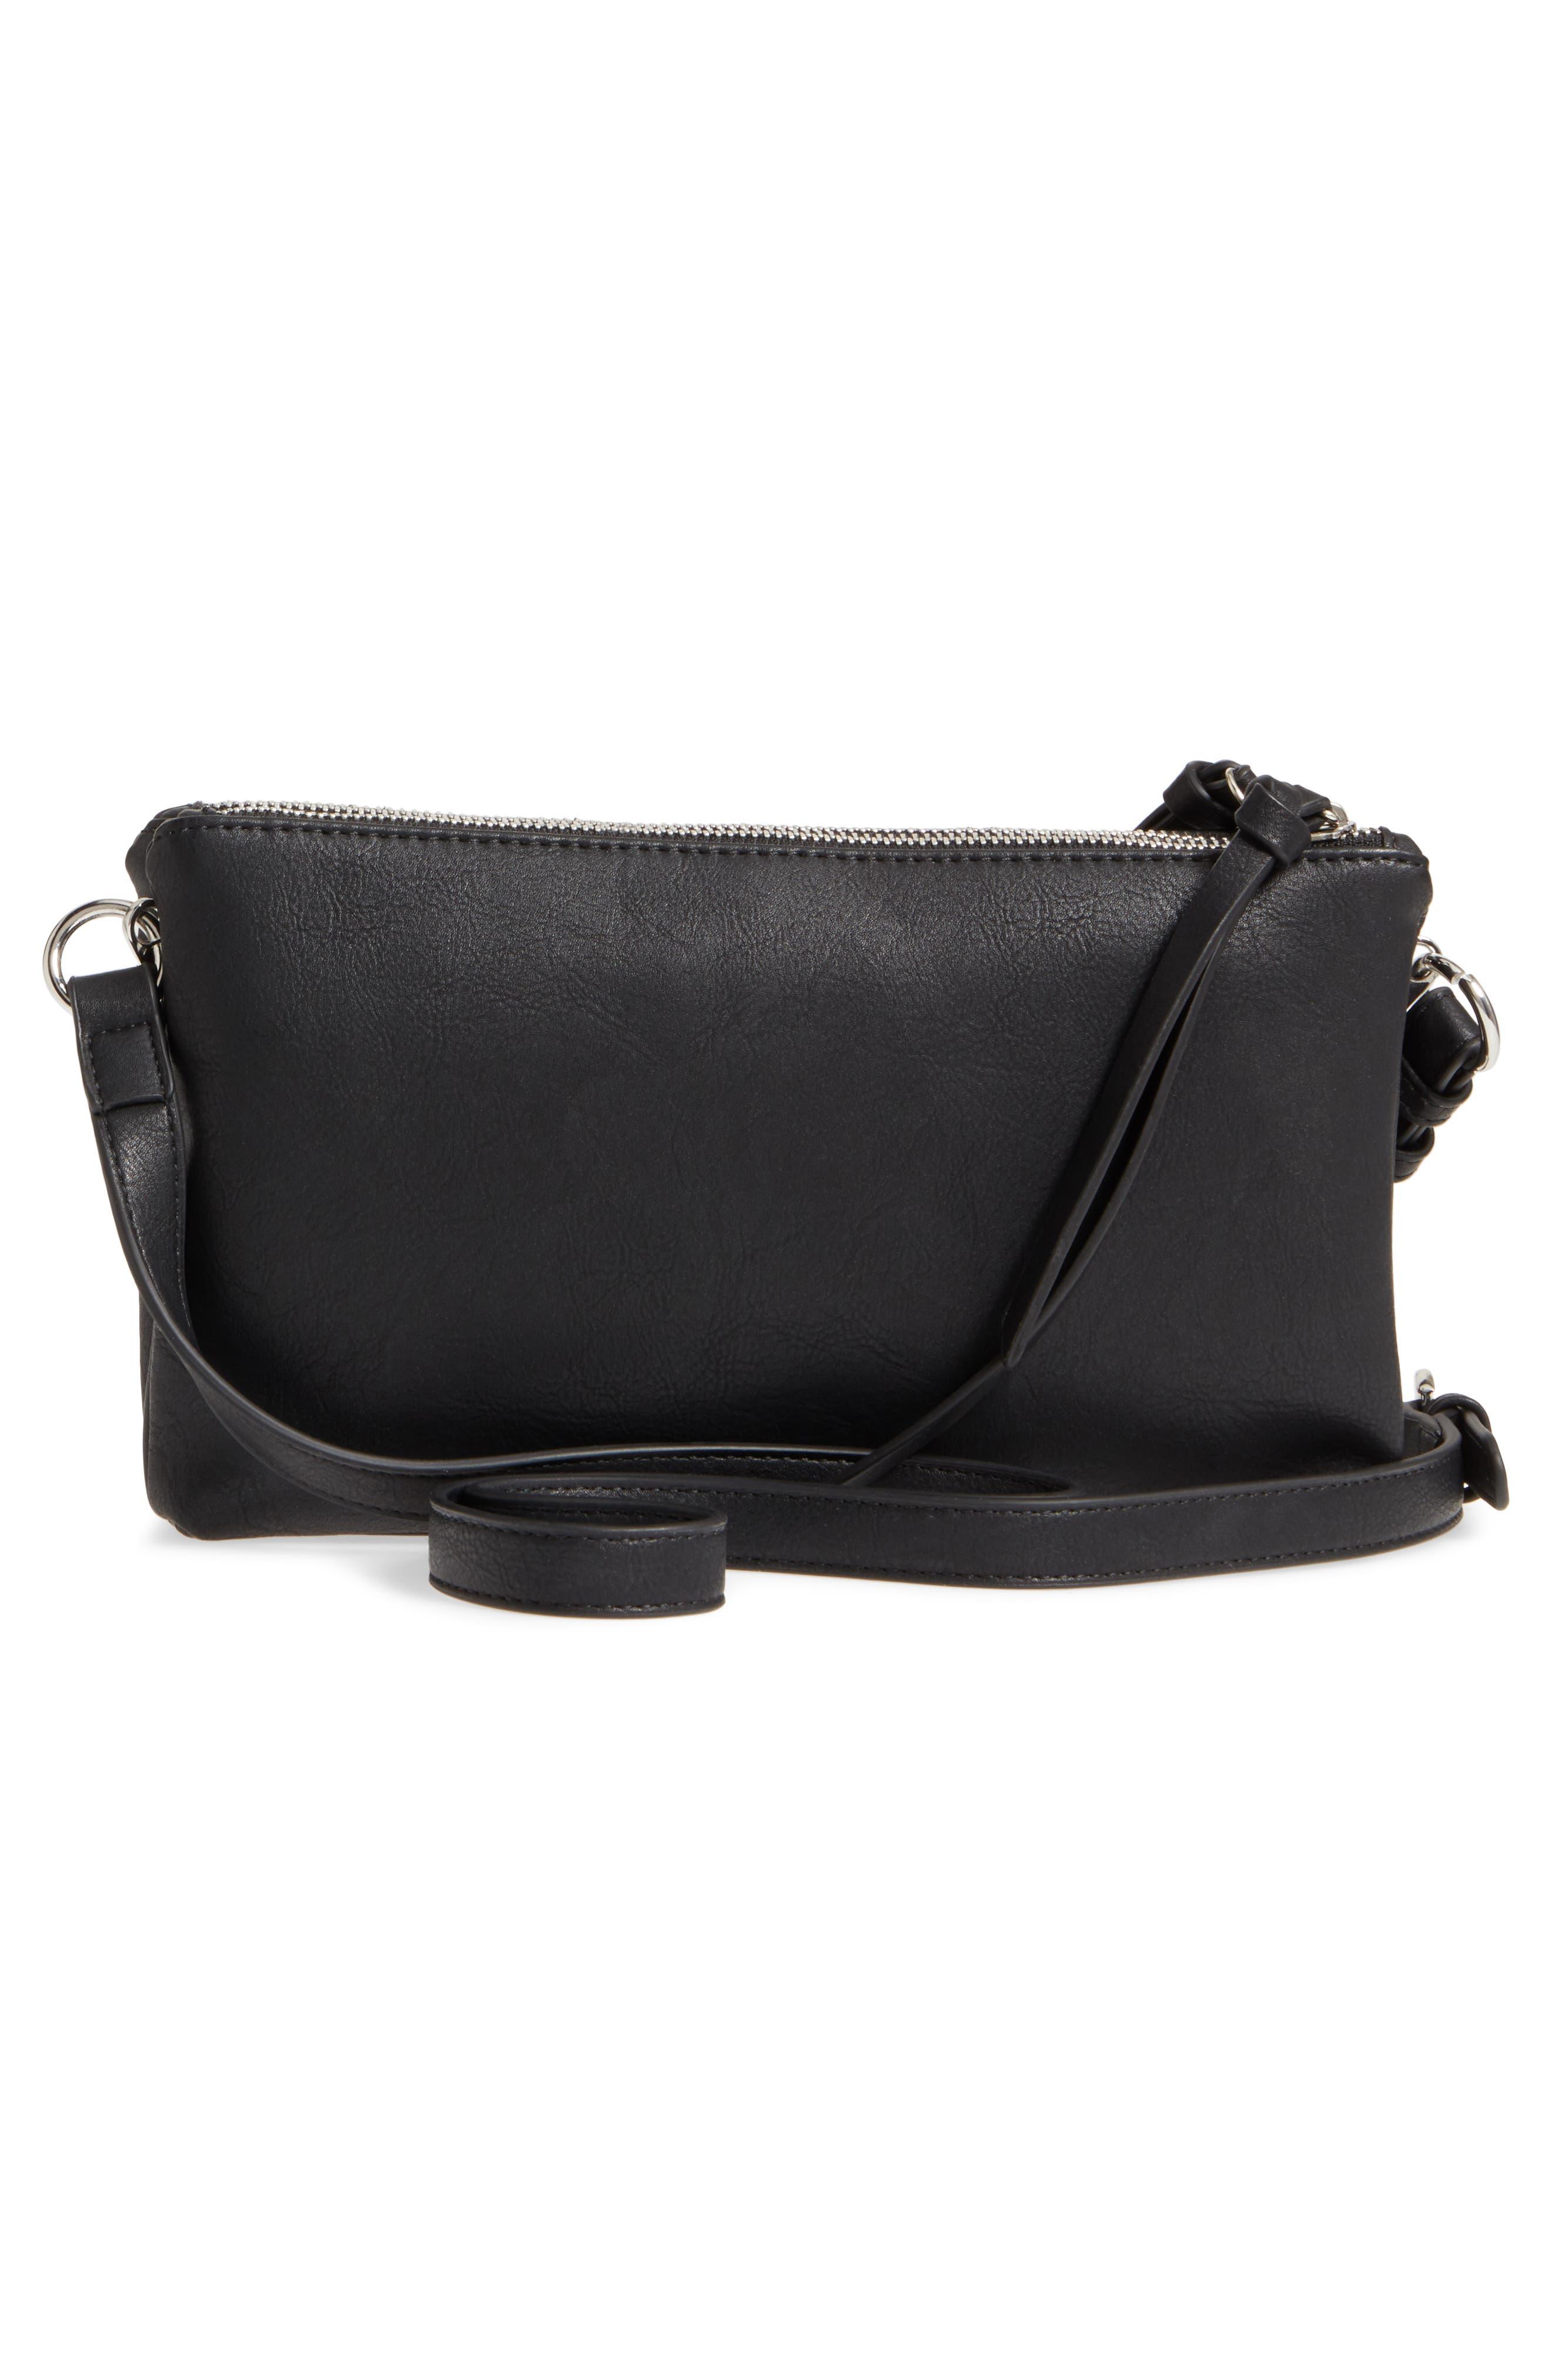 Kia Double Zip Faux Leather Crossbody Bag,                             Alternate thumbnail 3, color,                             001